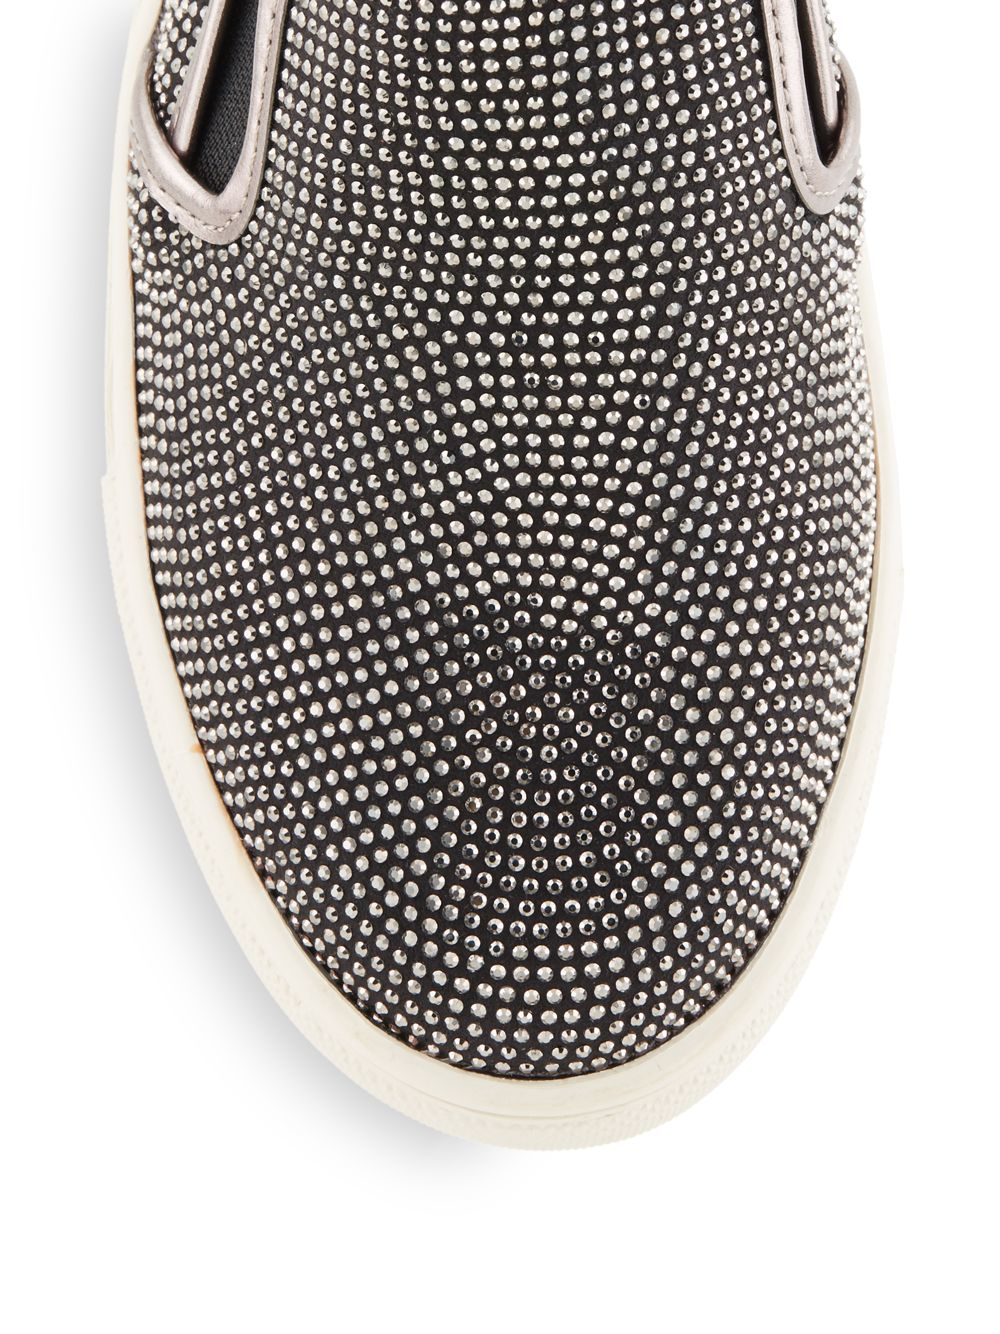 Steve Madden Exsess Rhinestone Slip On Sneakers In Black